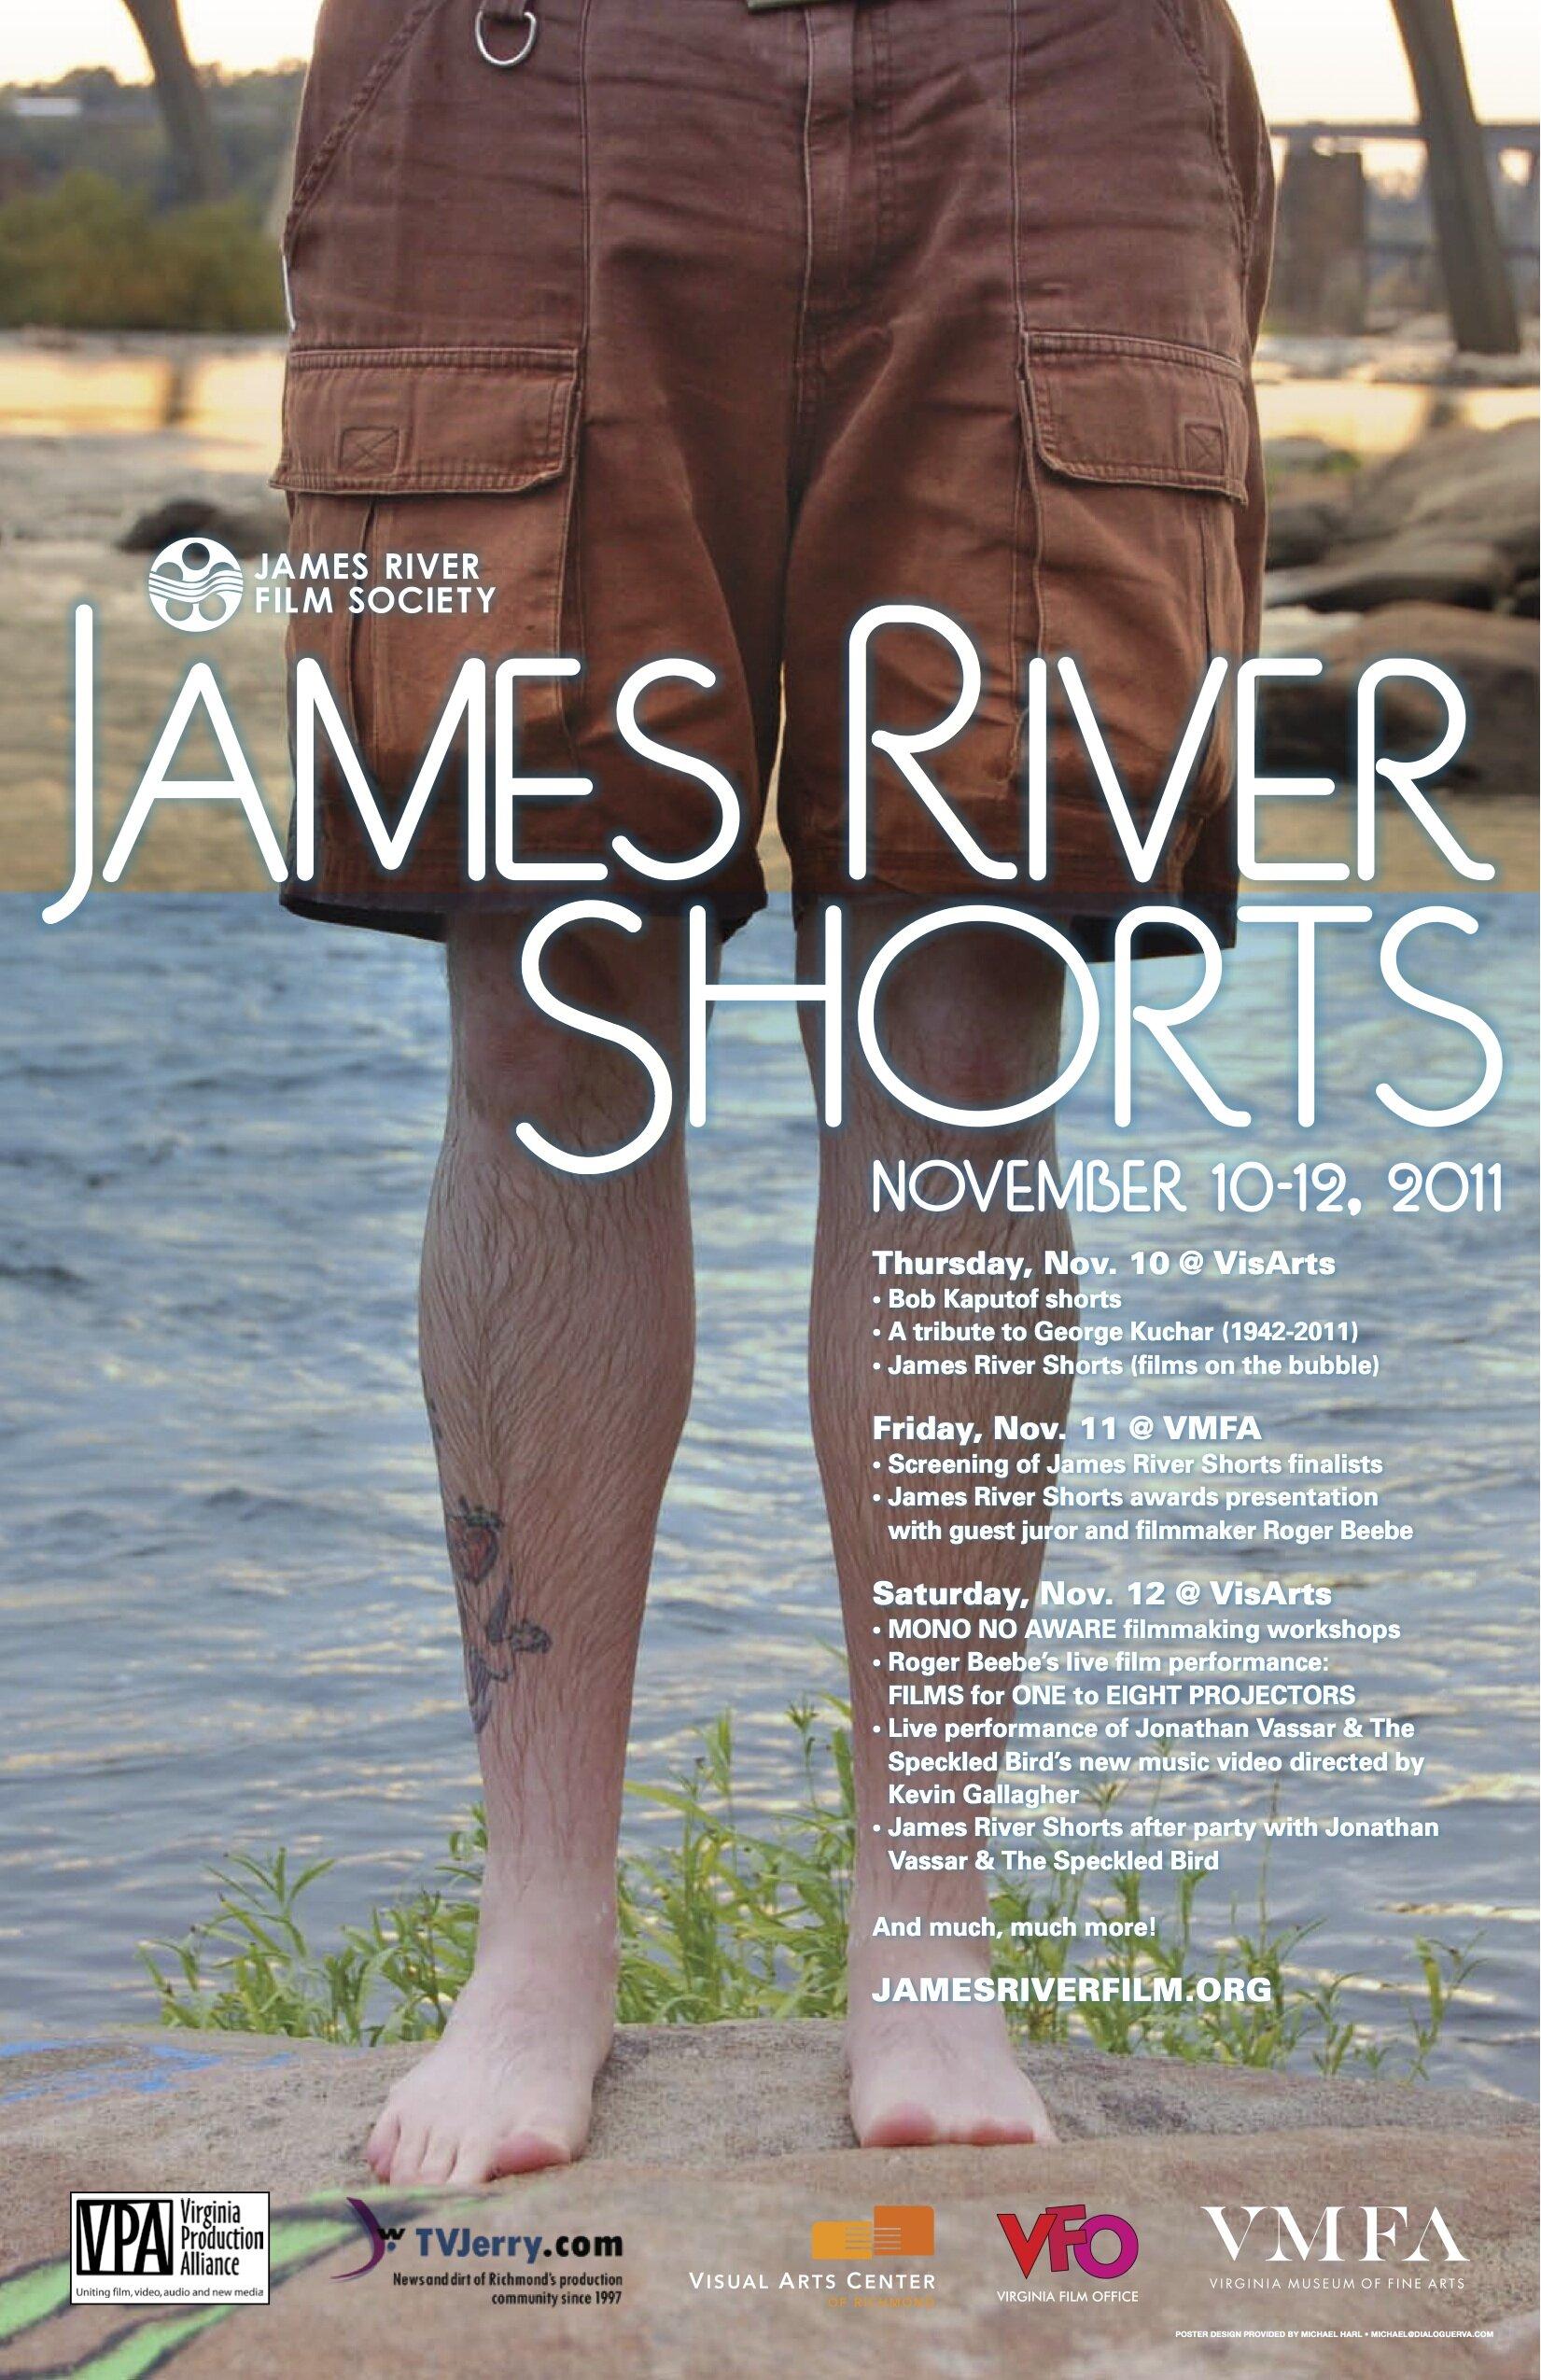 James-River-Shorts-photo.jpg